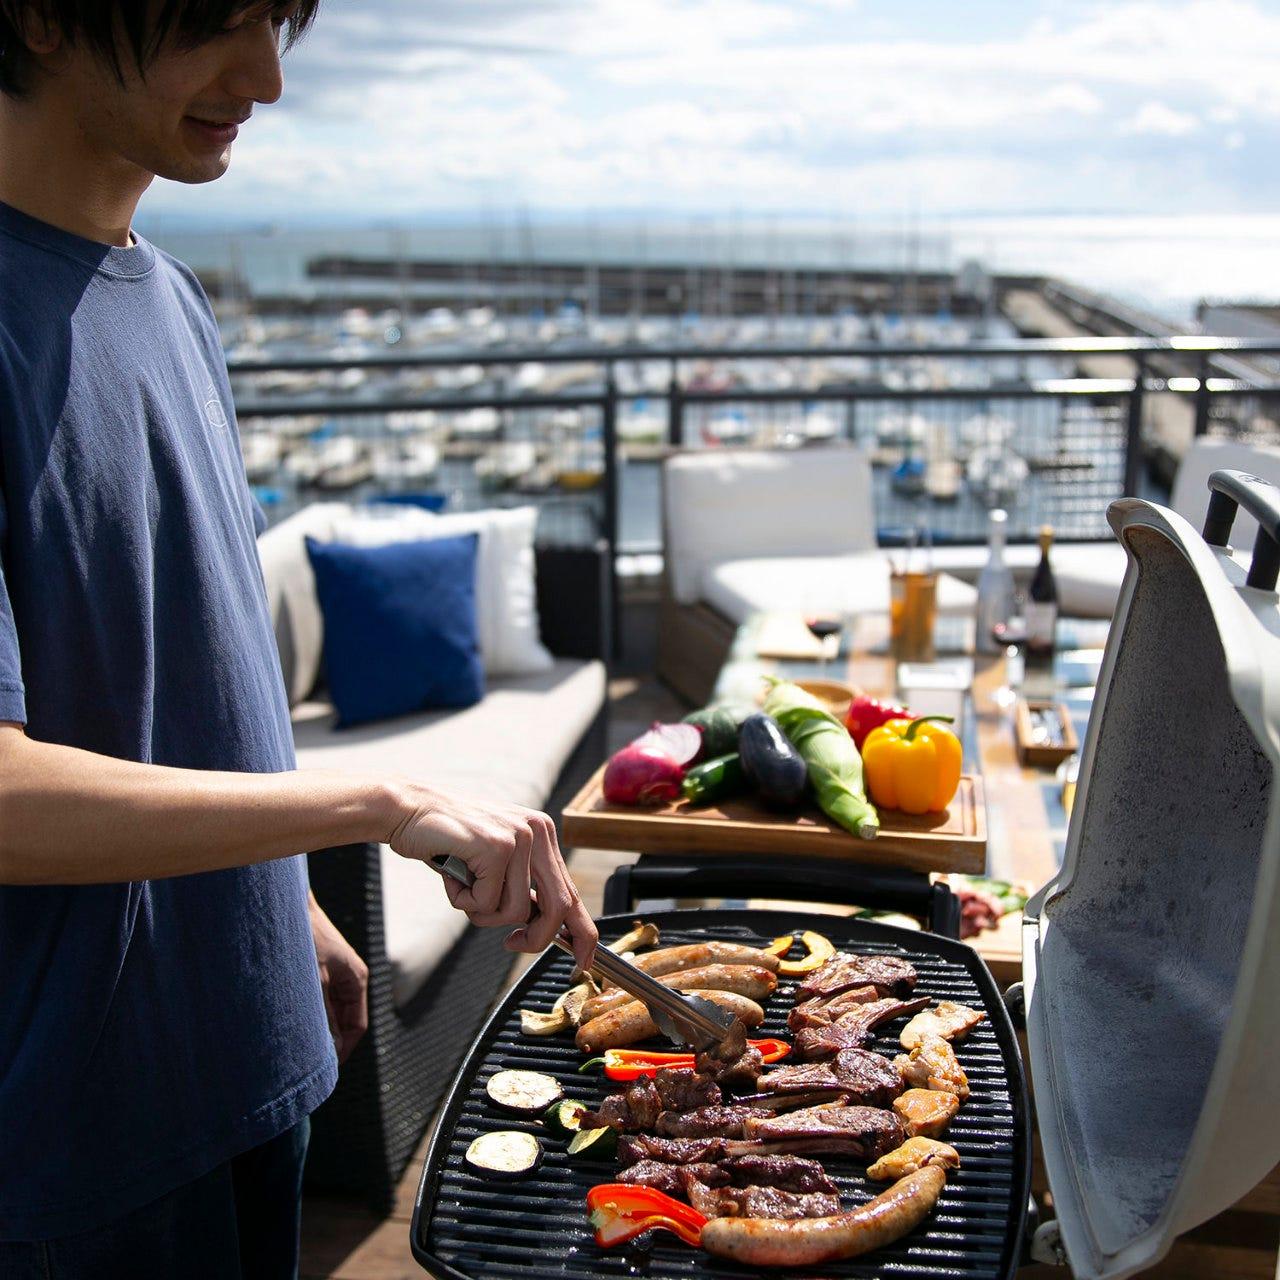 【NORTH SHORE須磨オリジナルプラン】牛、ラム、鶏、ソーセージに野菜たっぷりで大満足!